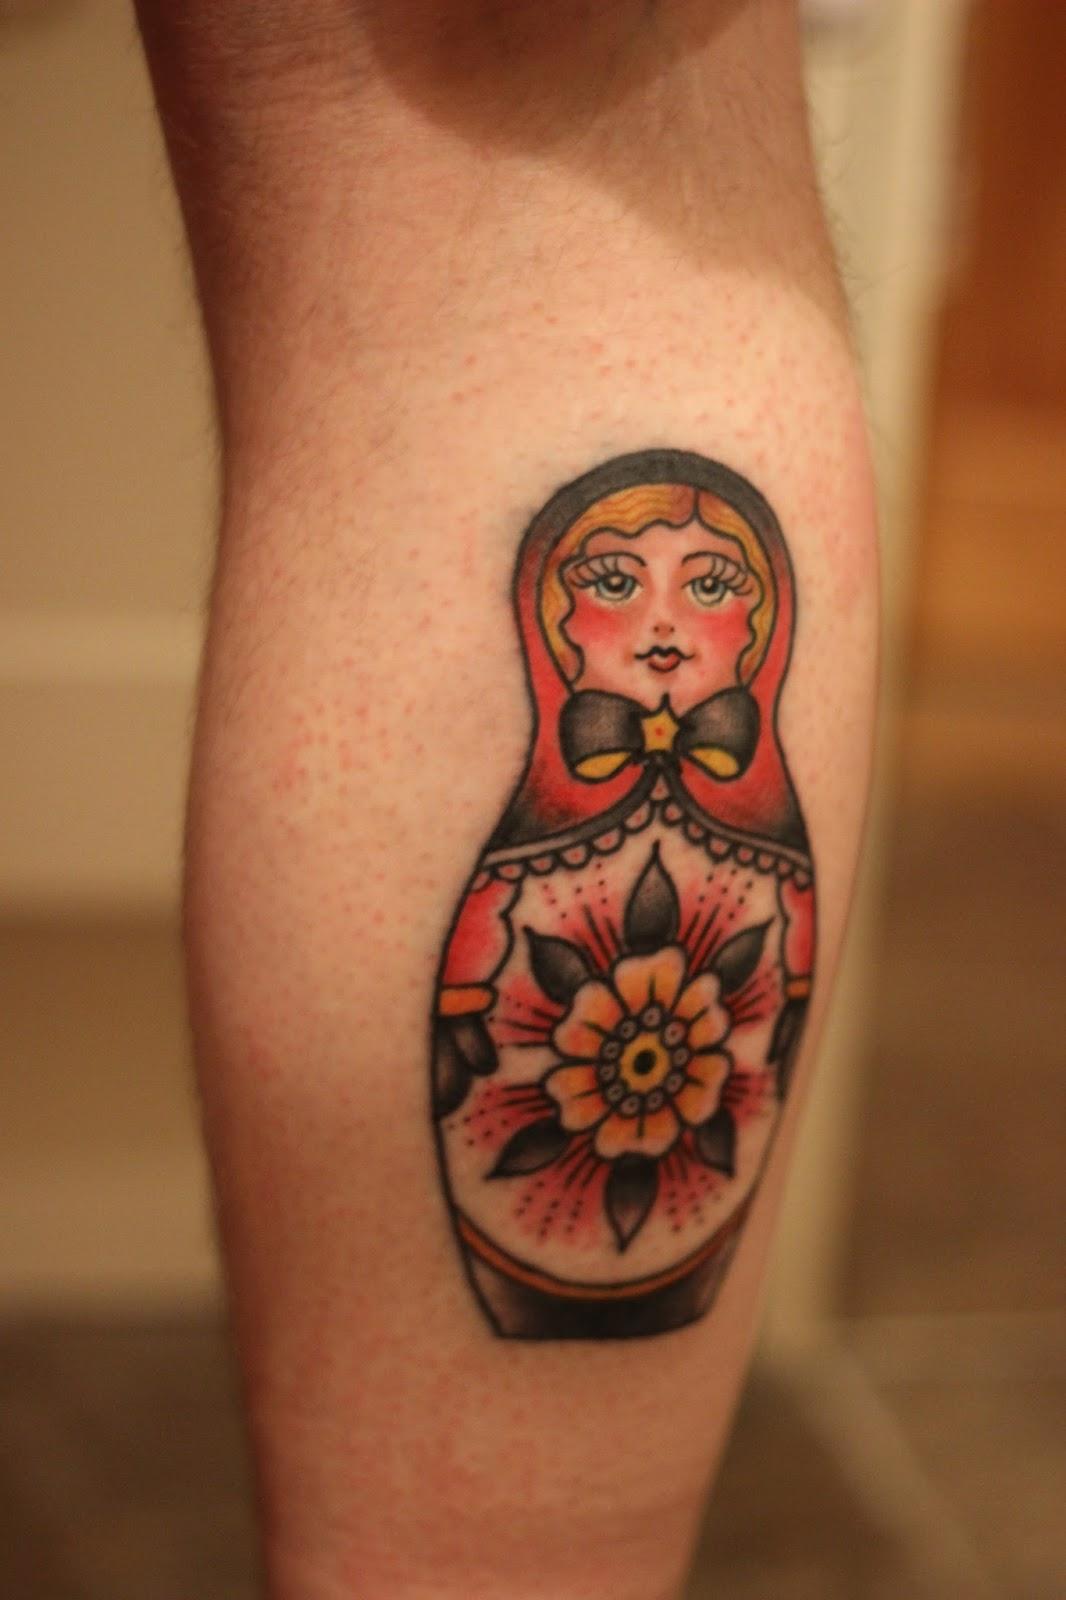 Vintage Style Tattoos For Women John's tattoo Vintage Tattoos For Women